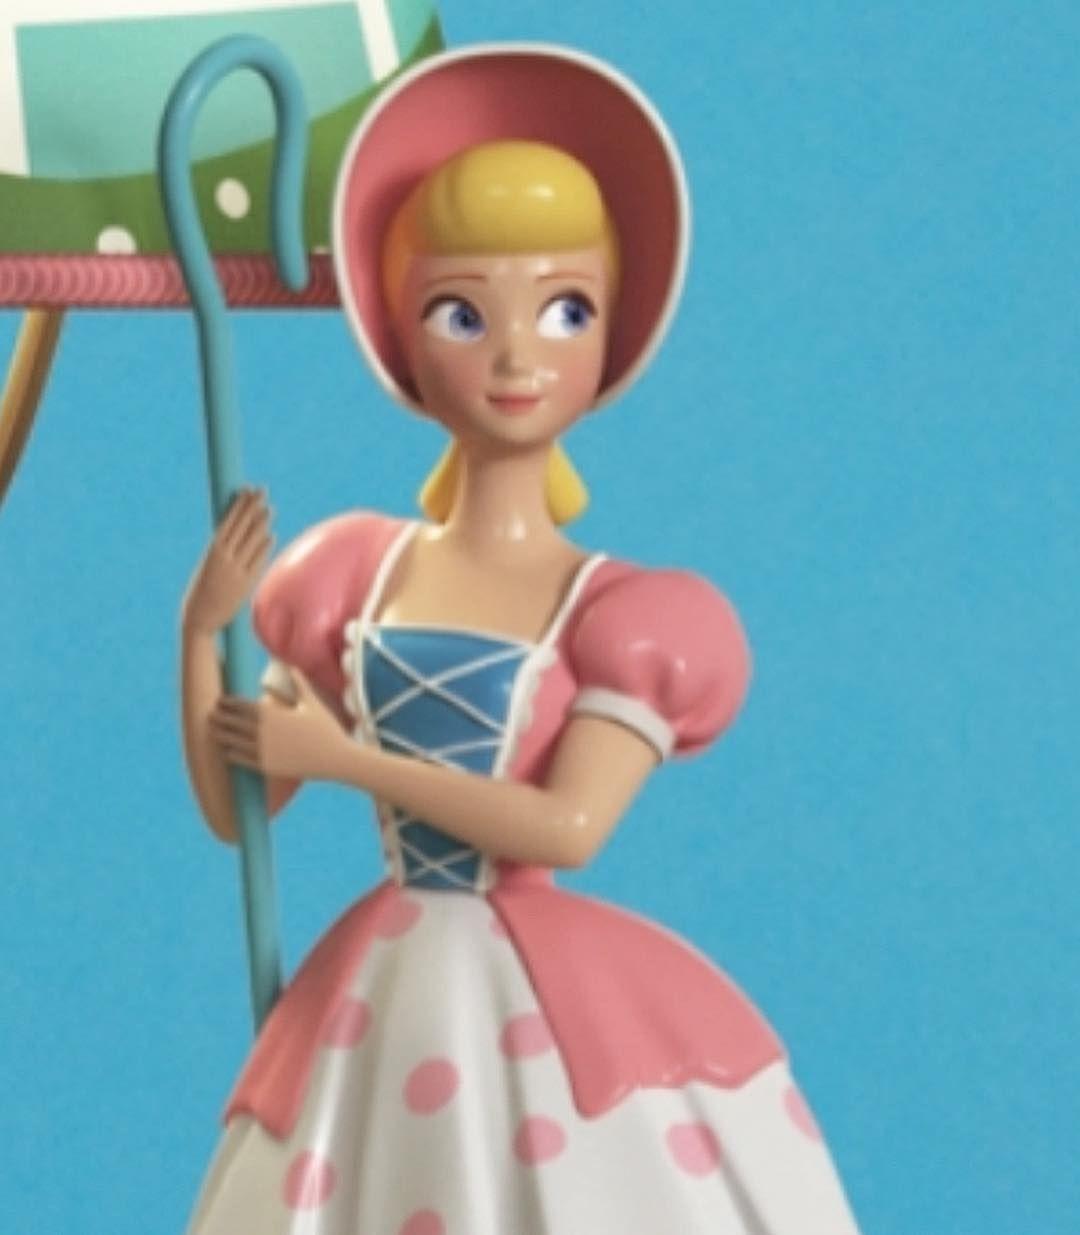 La Imagen Puede Contener Una Persona Toy Story Little Bo Peep Disney And Dreamworks